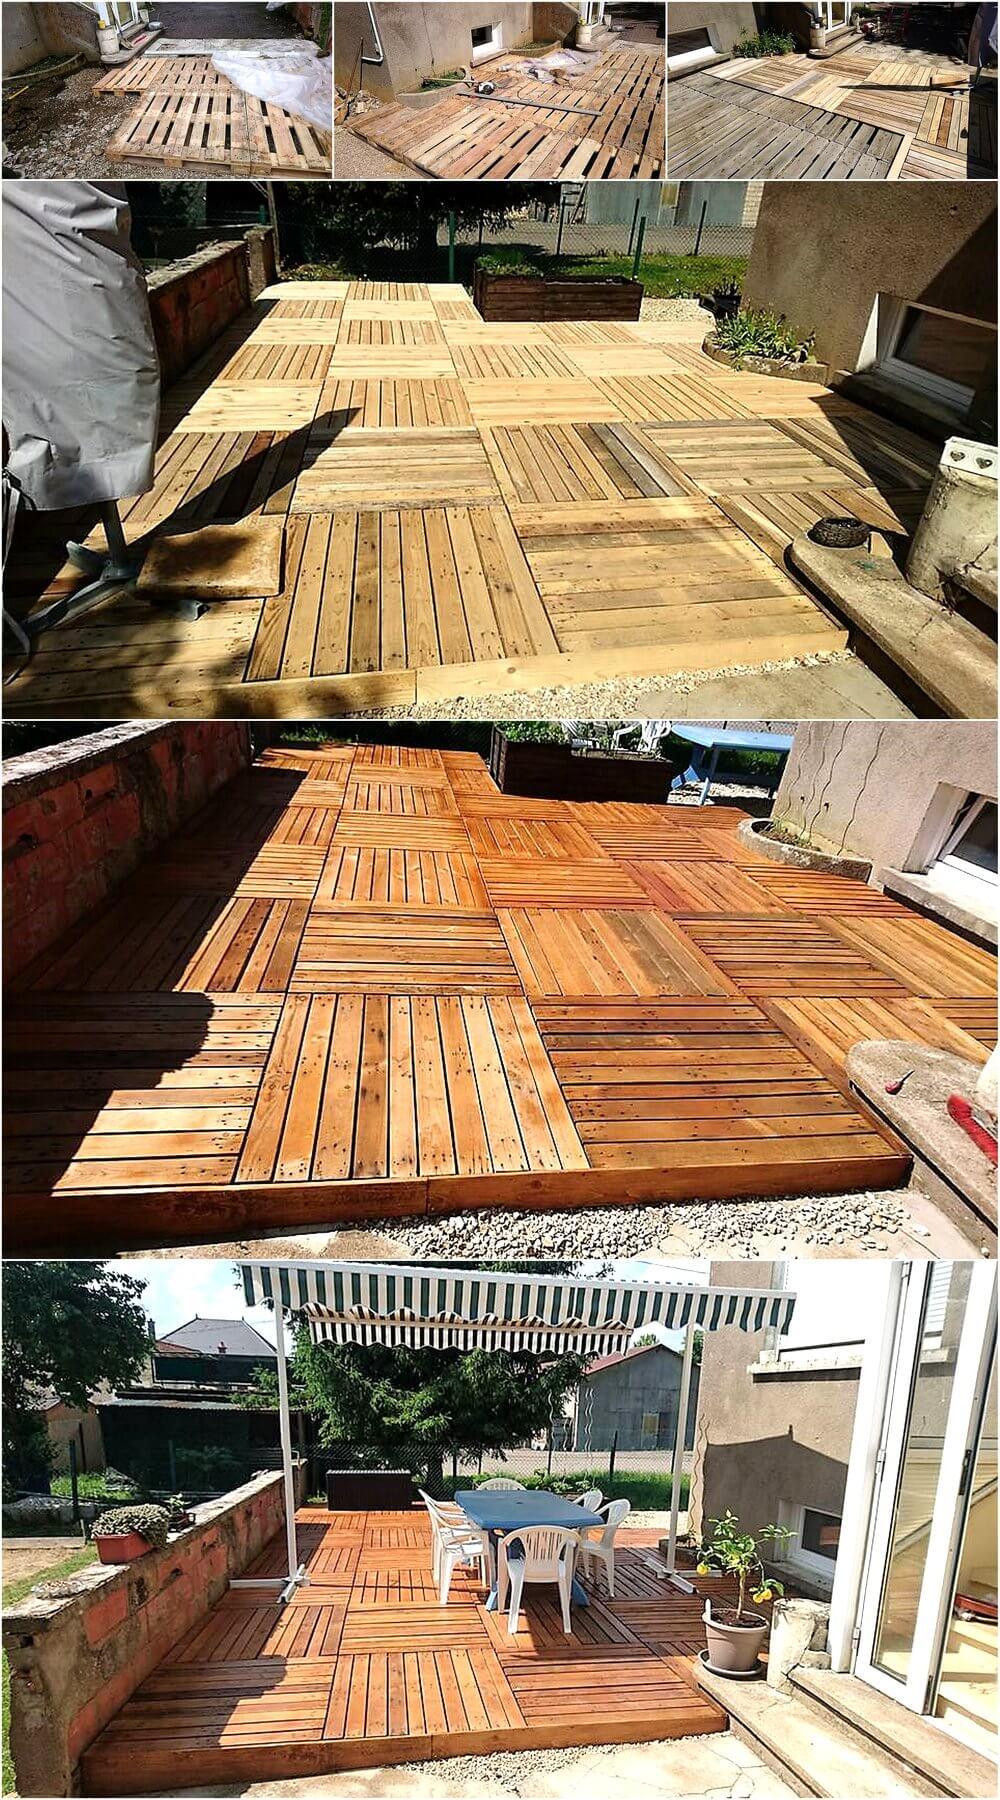 DIY Wooden Pallets Garden Terrace | Wood Pallet Furniture on Diy Garden Patio Ideas id=16897